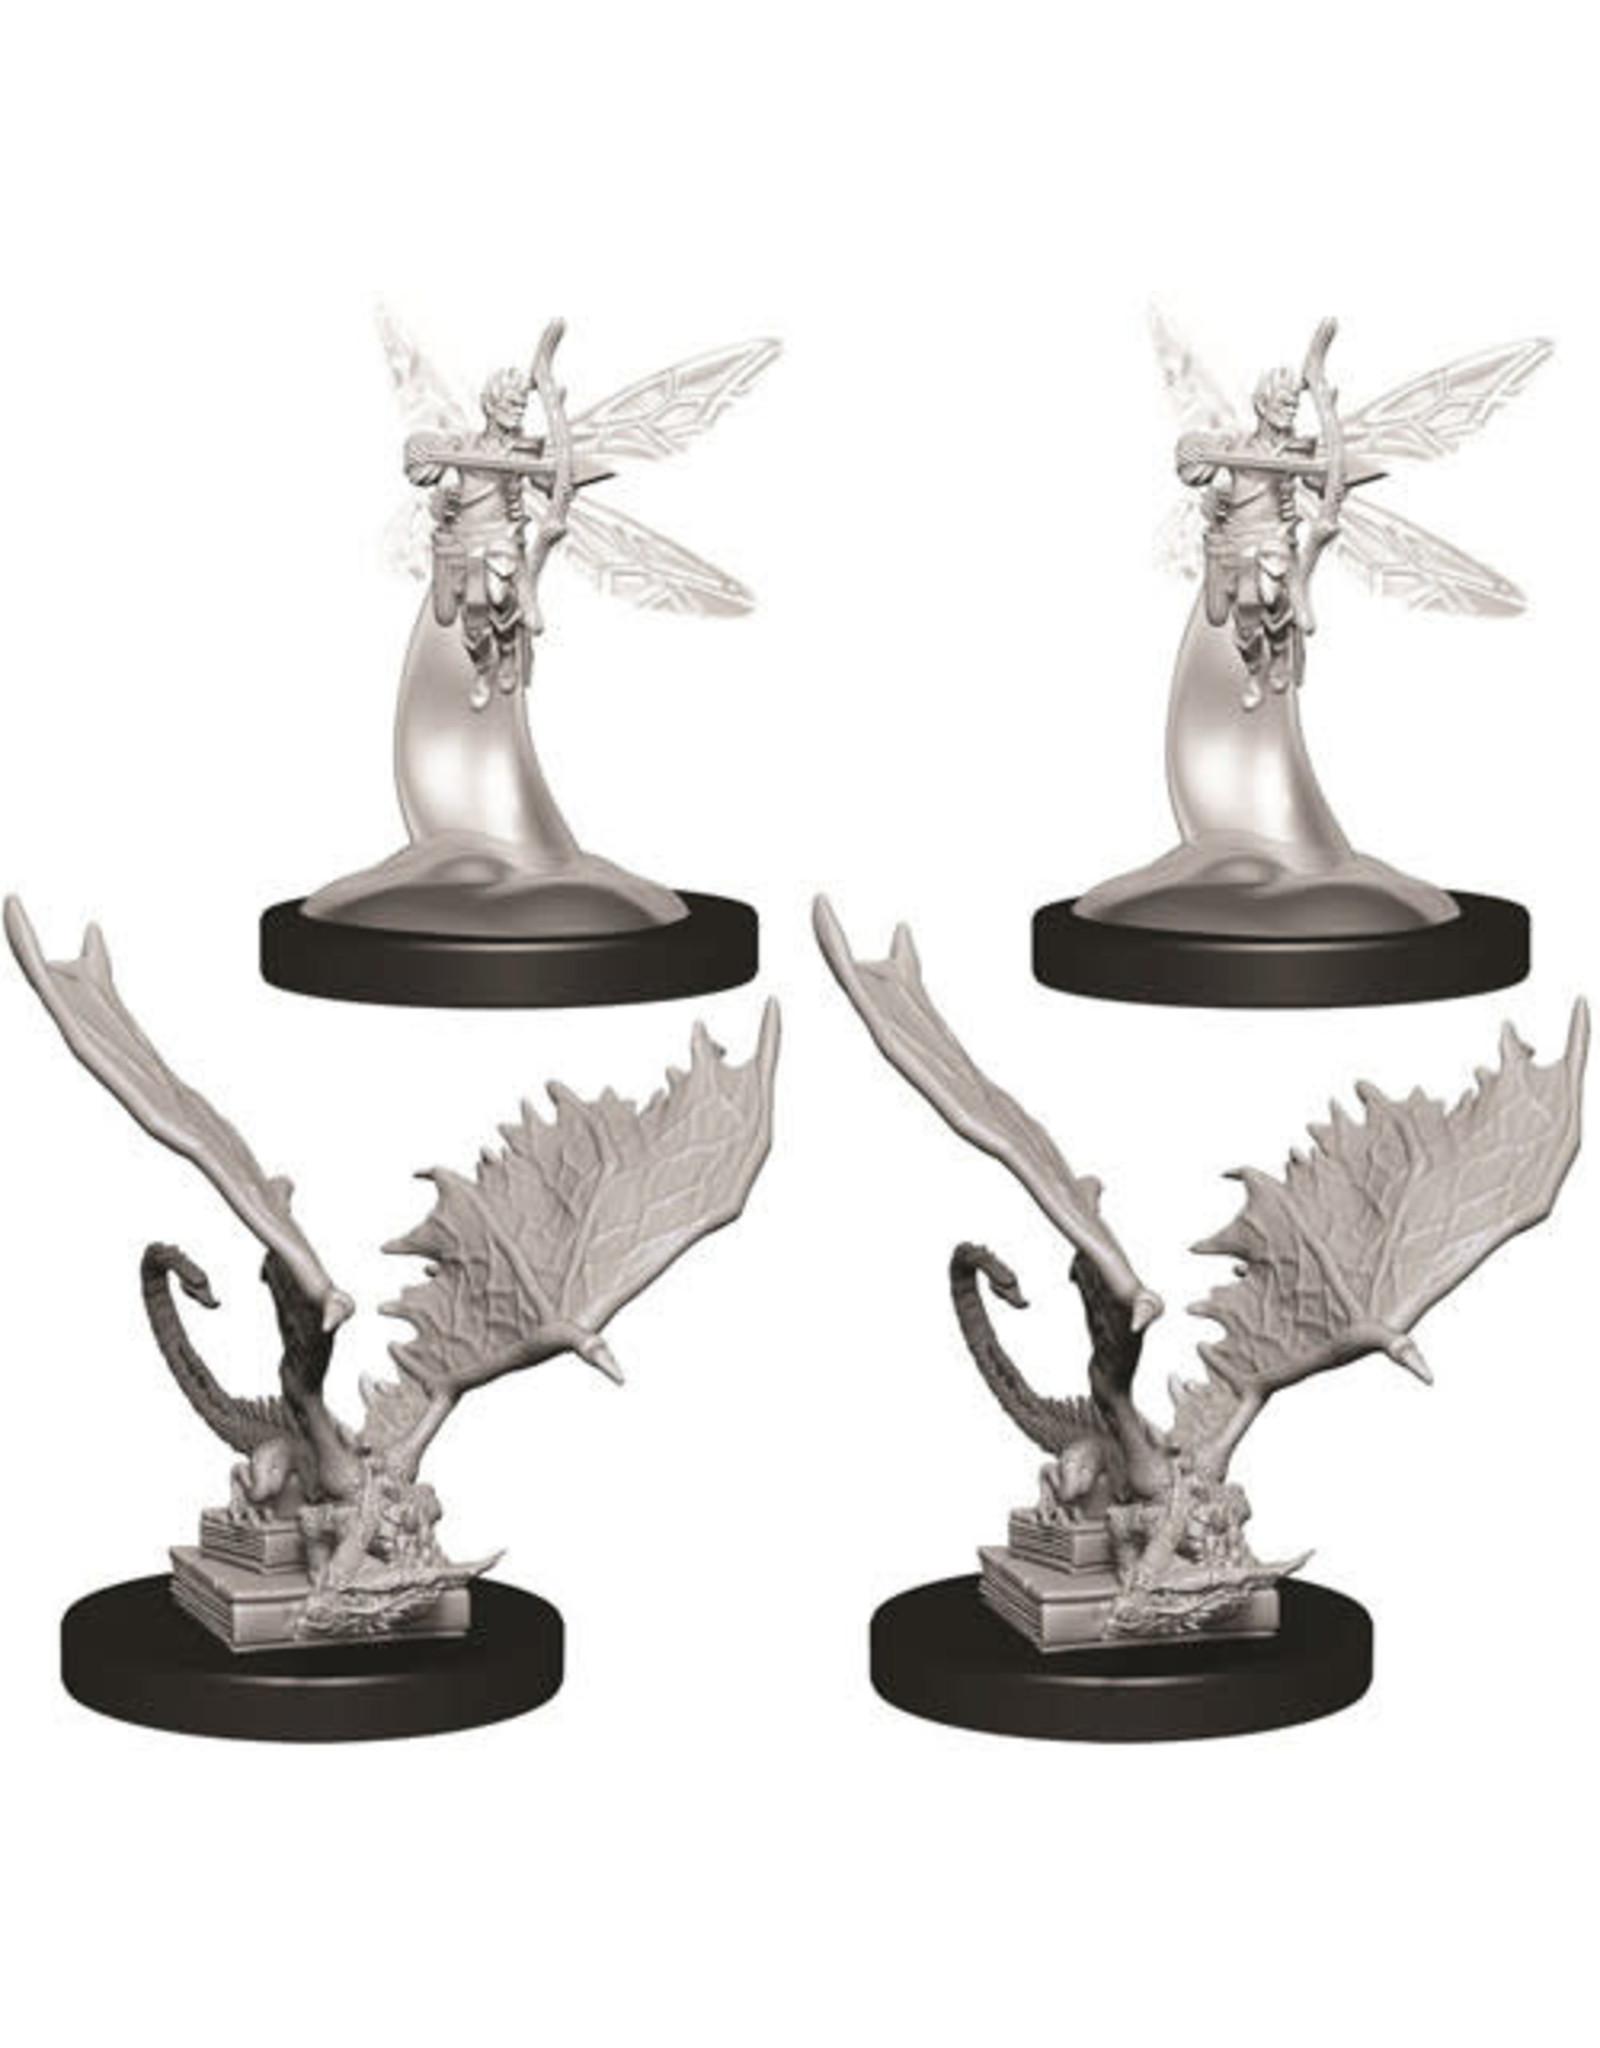 WizKids Dungeons & Dragons Nolzur`s Marvelous Unpainted Miniatures: W9 Sprite & Pseudodragon